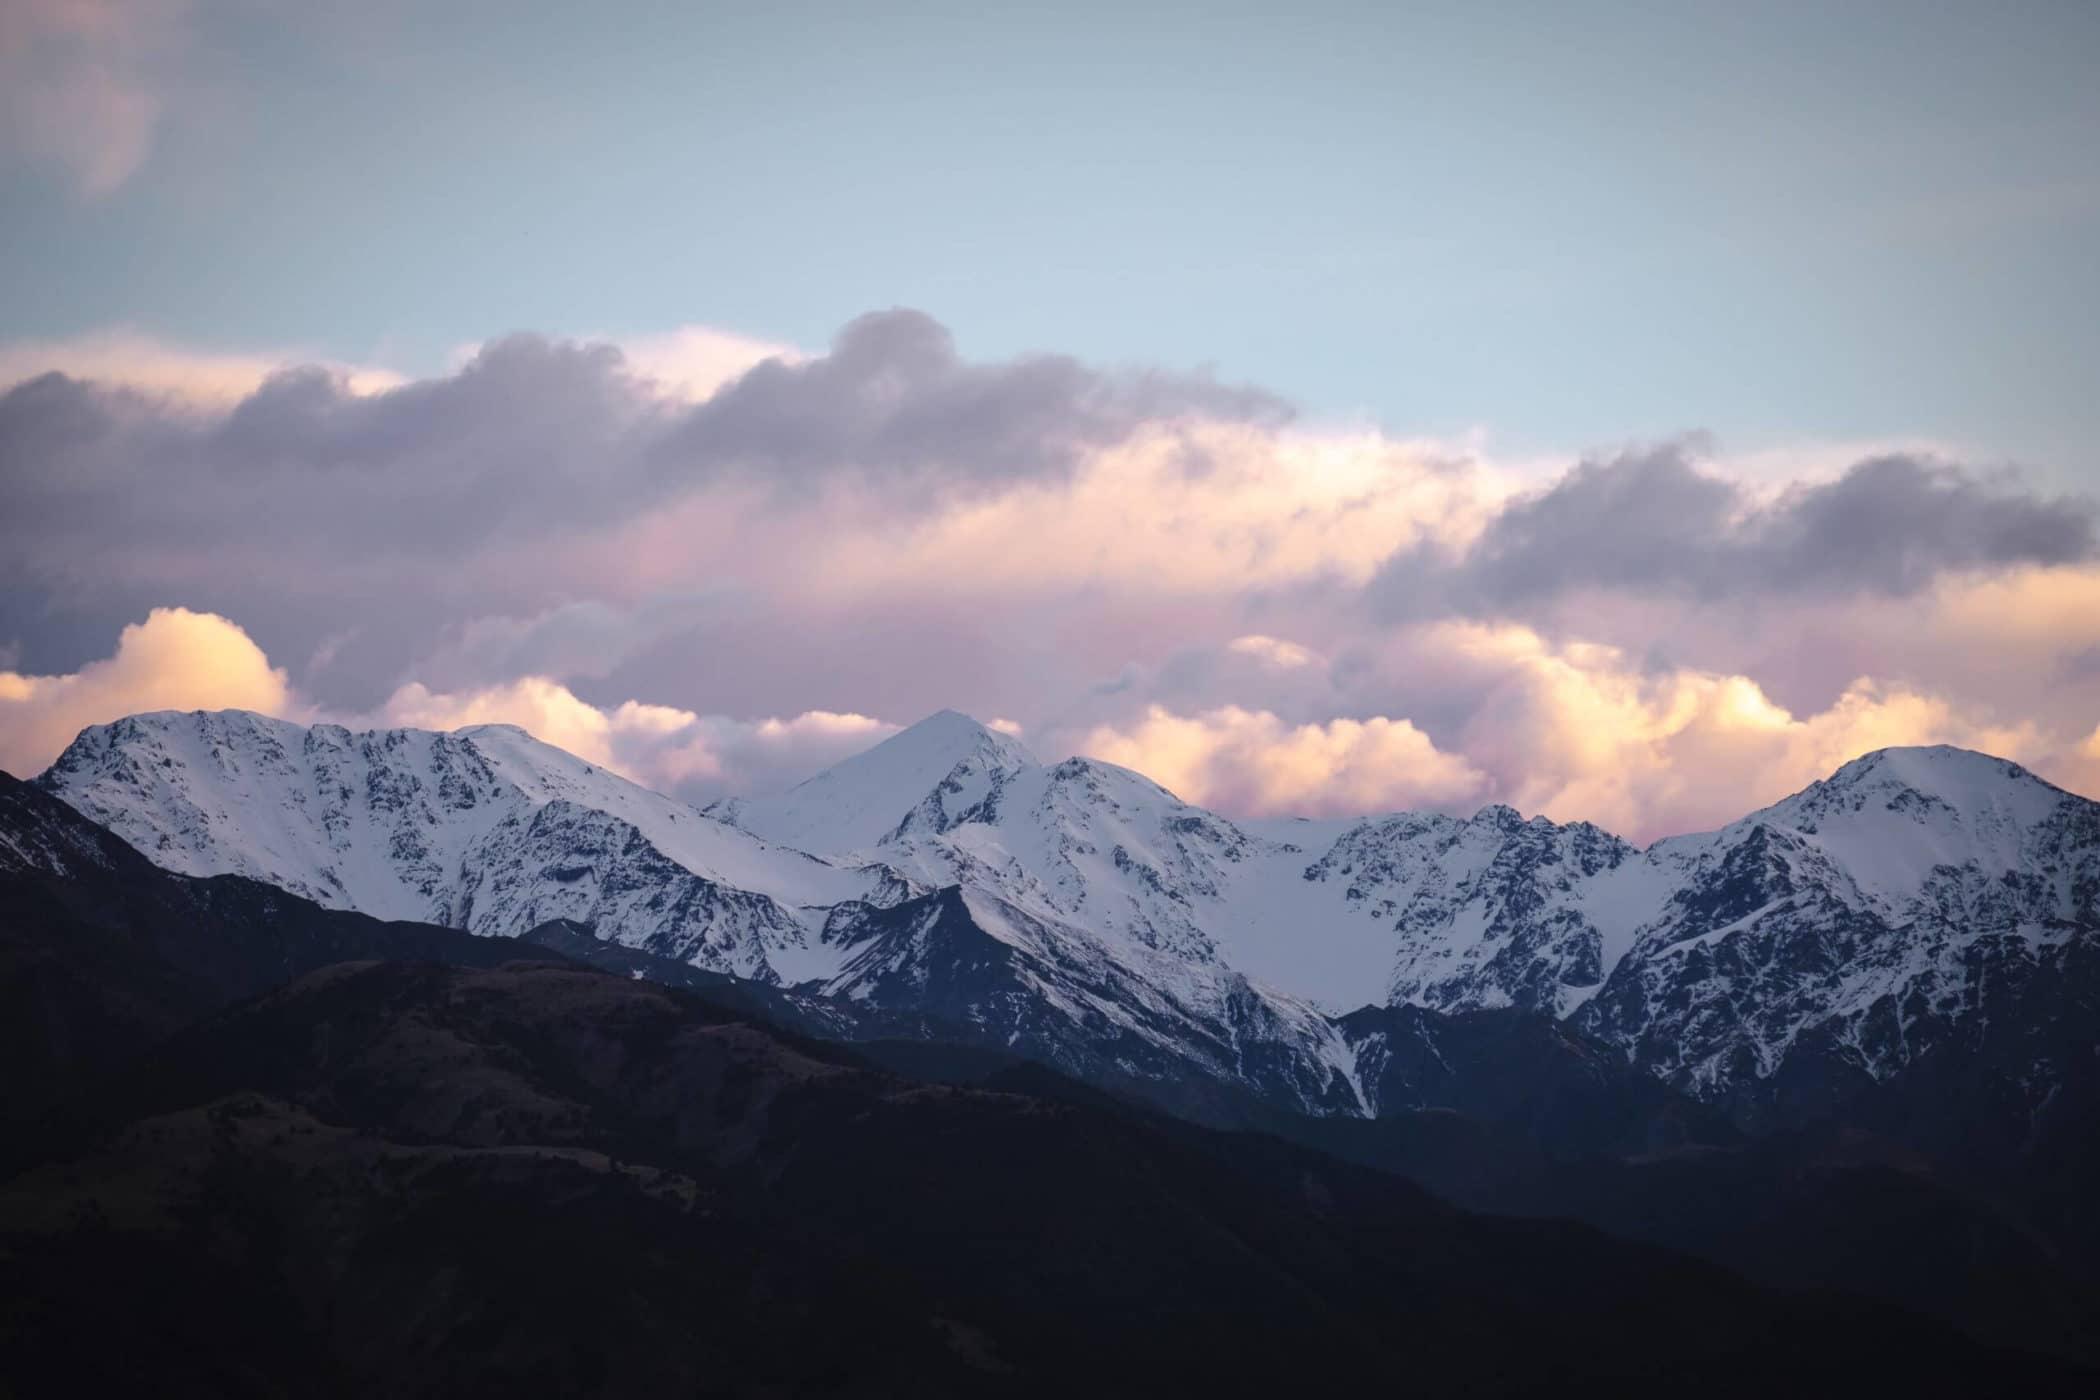 Mountaintop sunrise over Kaikoura, New Zealand